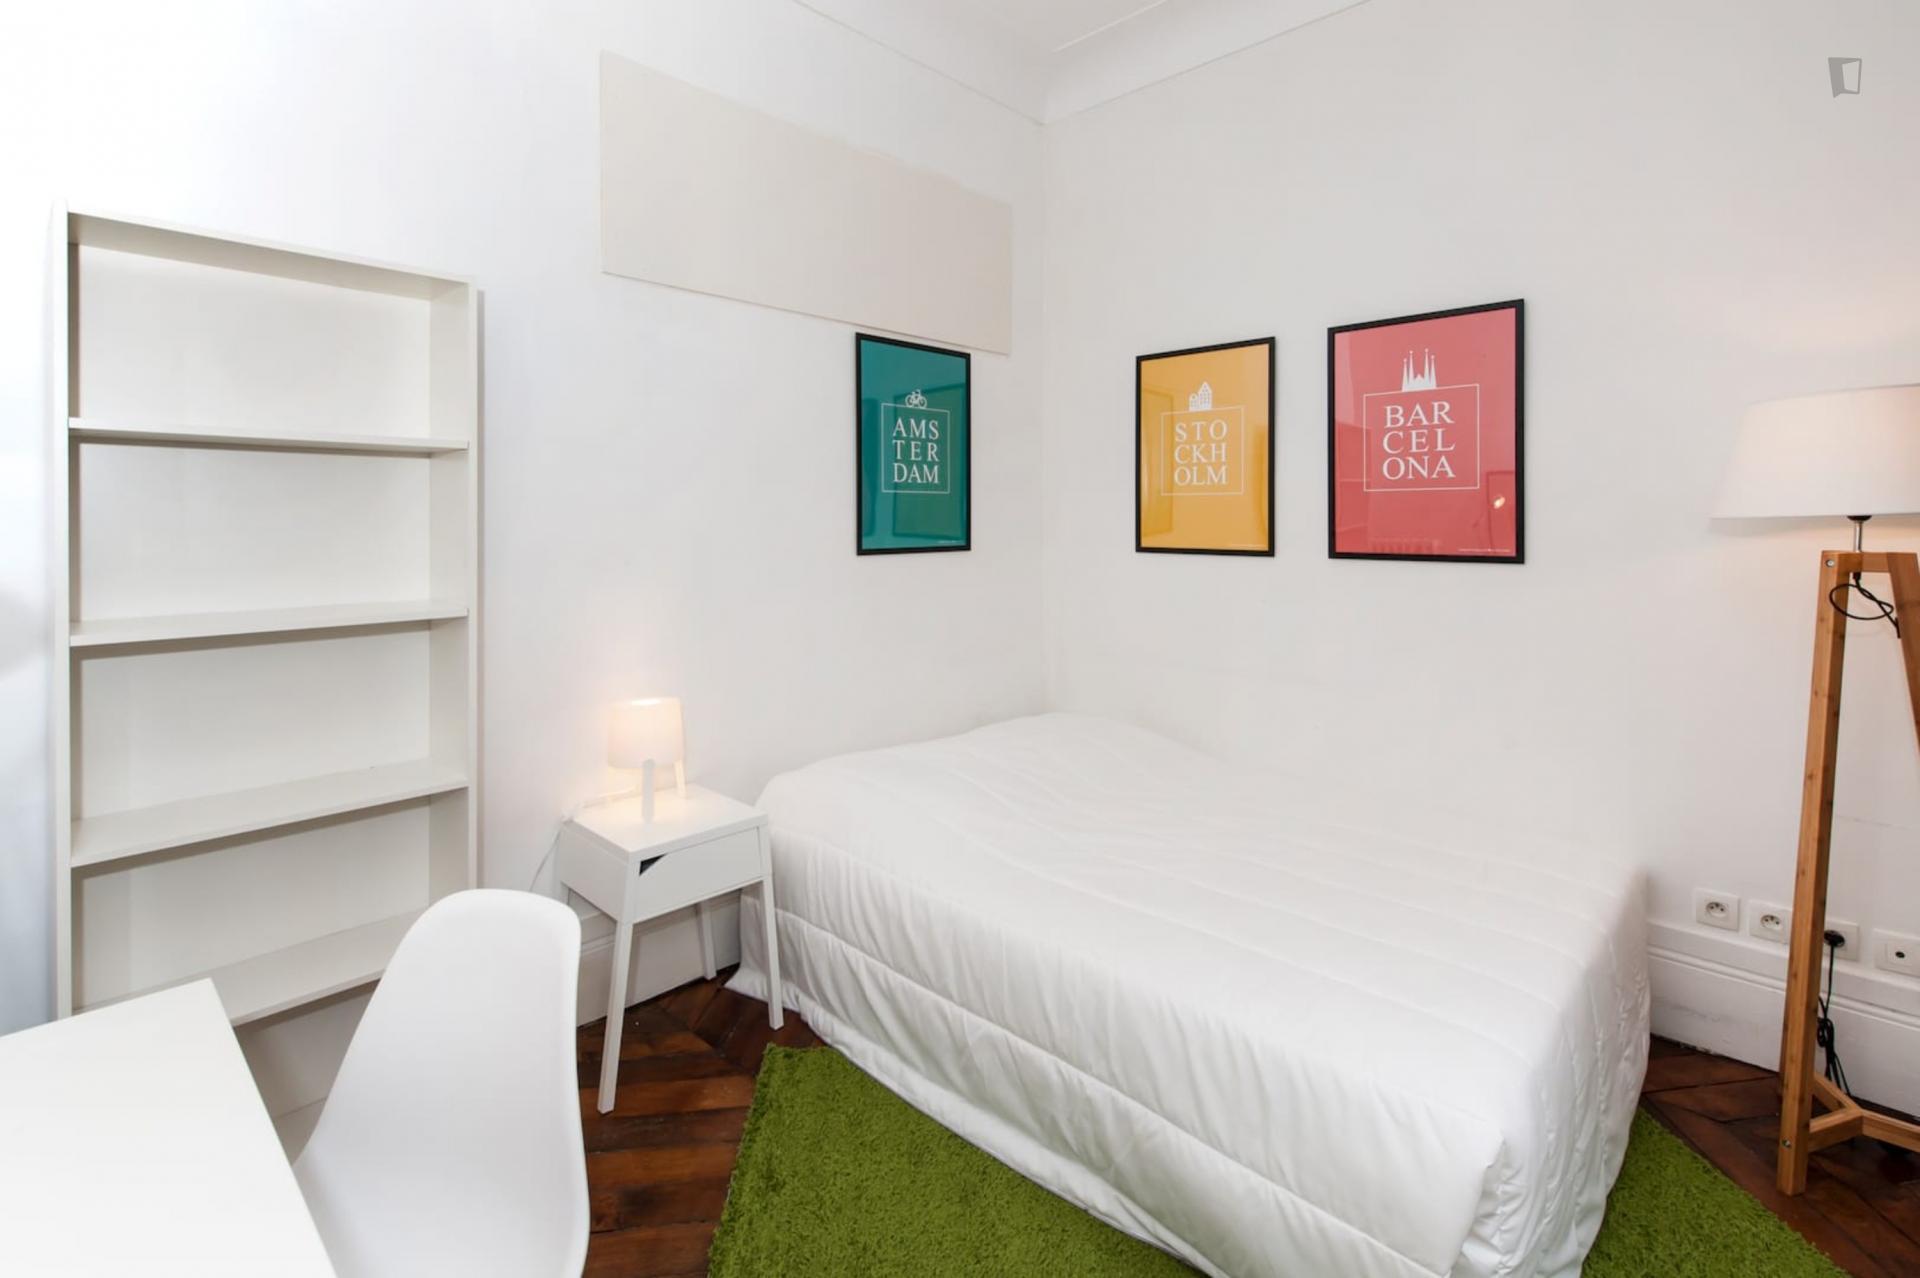 Voltaire - Homely double bedroom in Paris